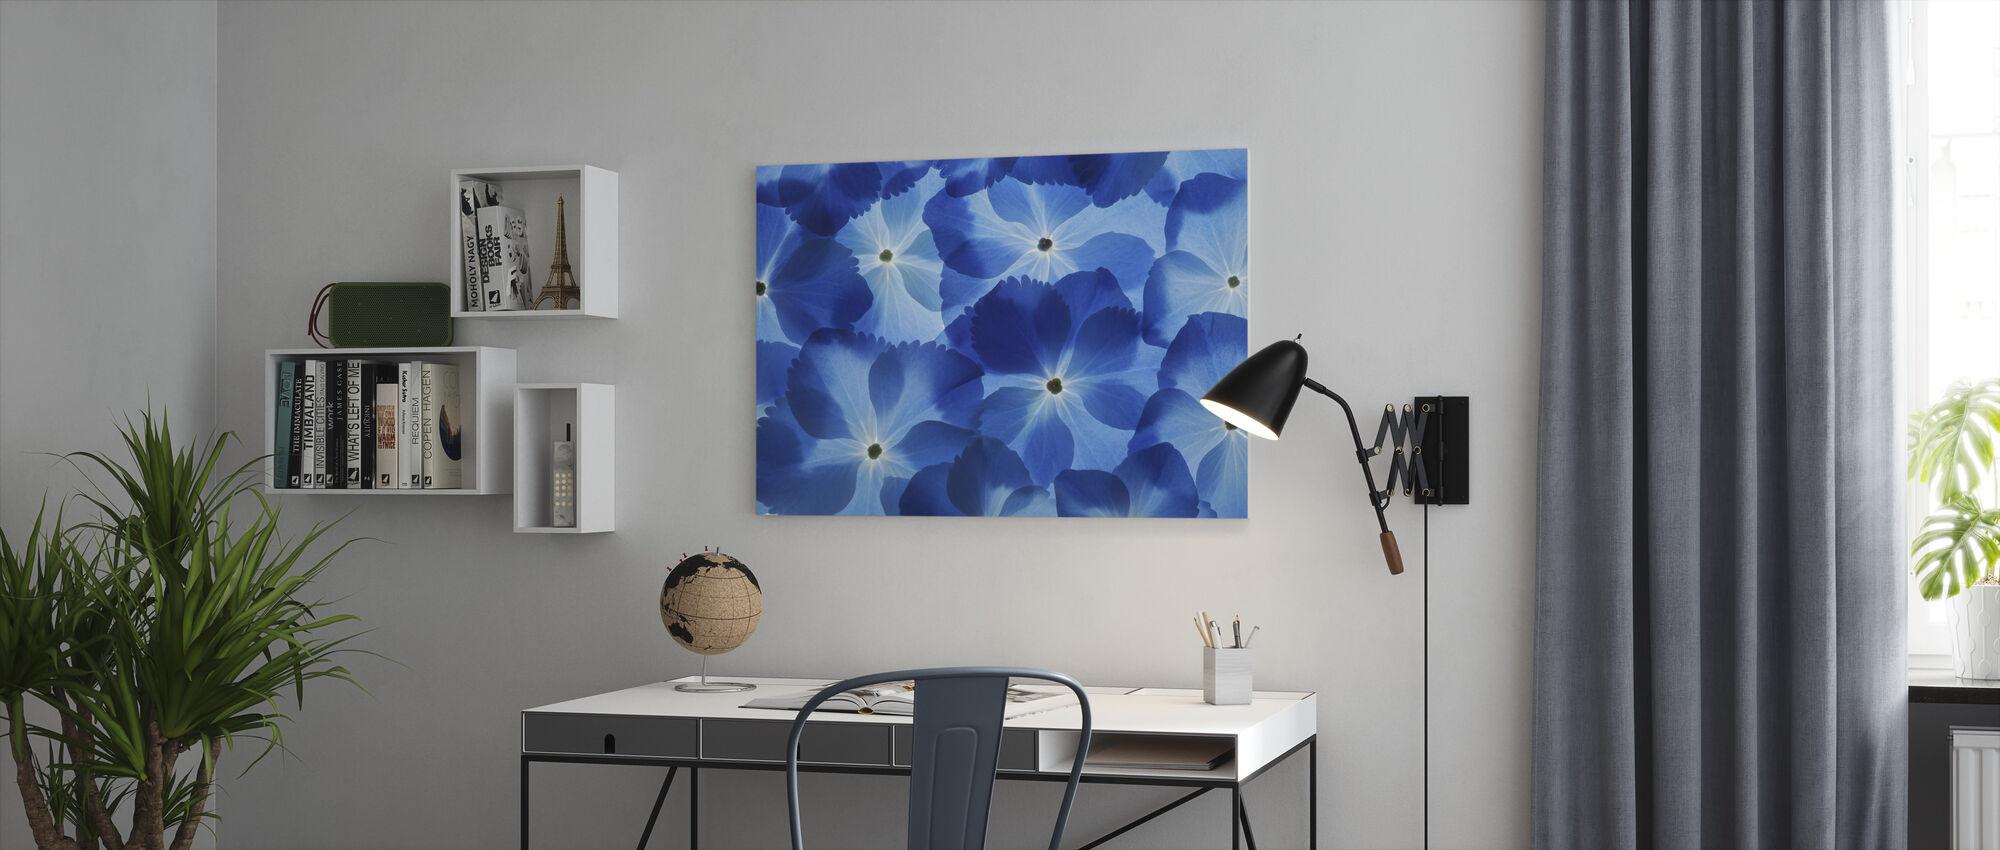 Blue Hortensia - Canvas print - Office